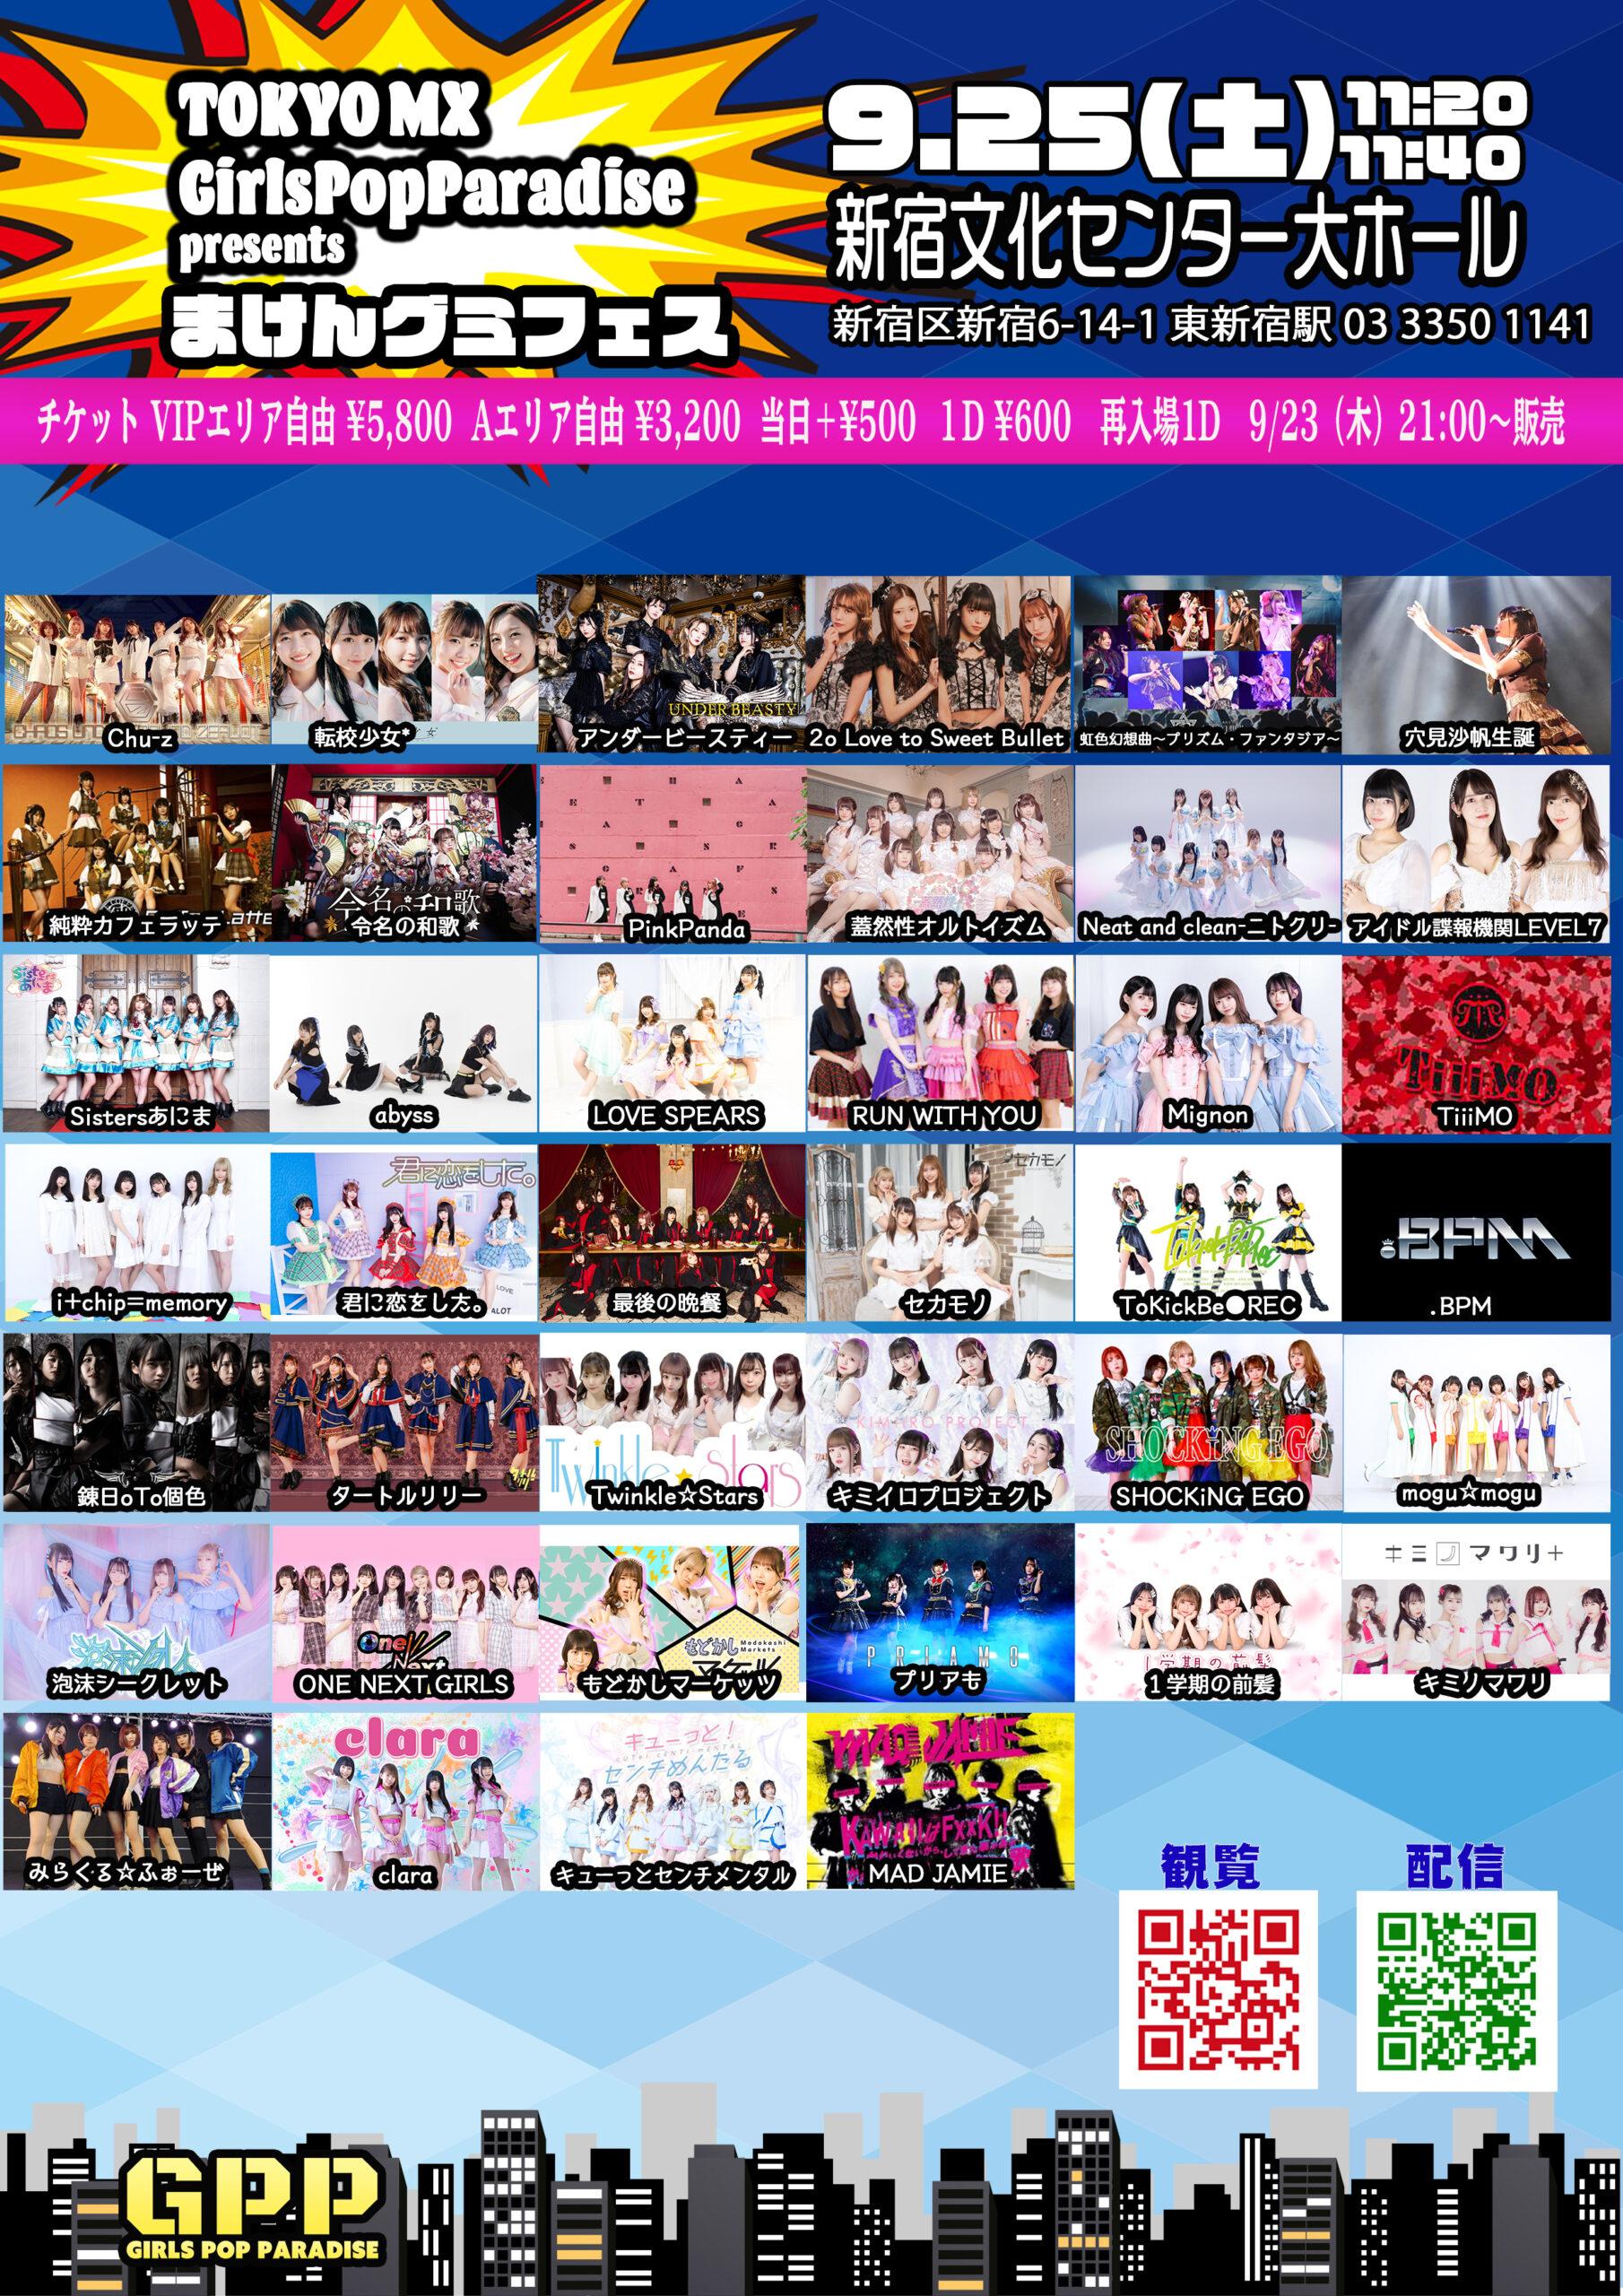 9/25TOKYO MX GirlsPopParadise presents まけんグミフェス